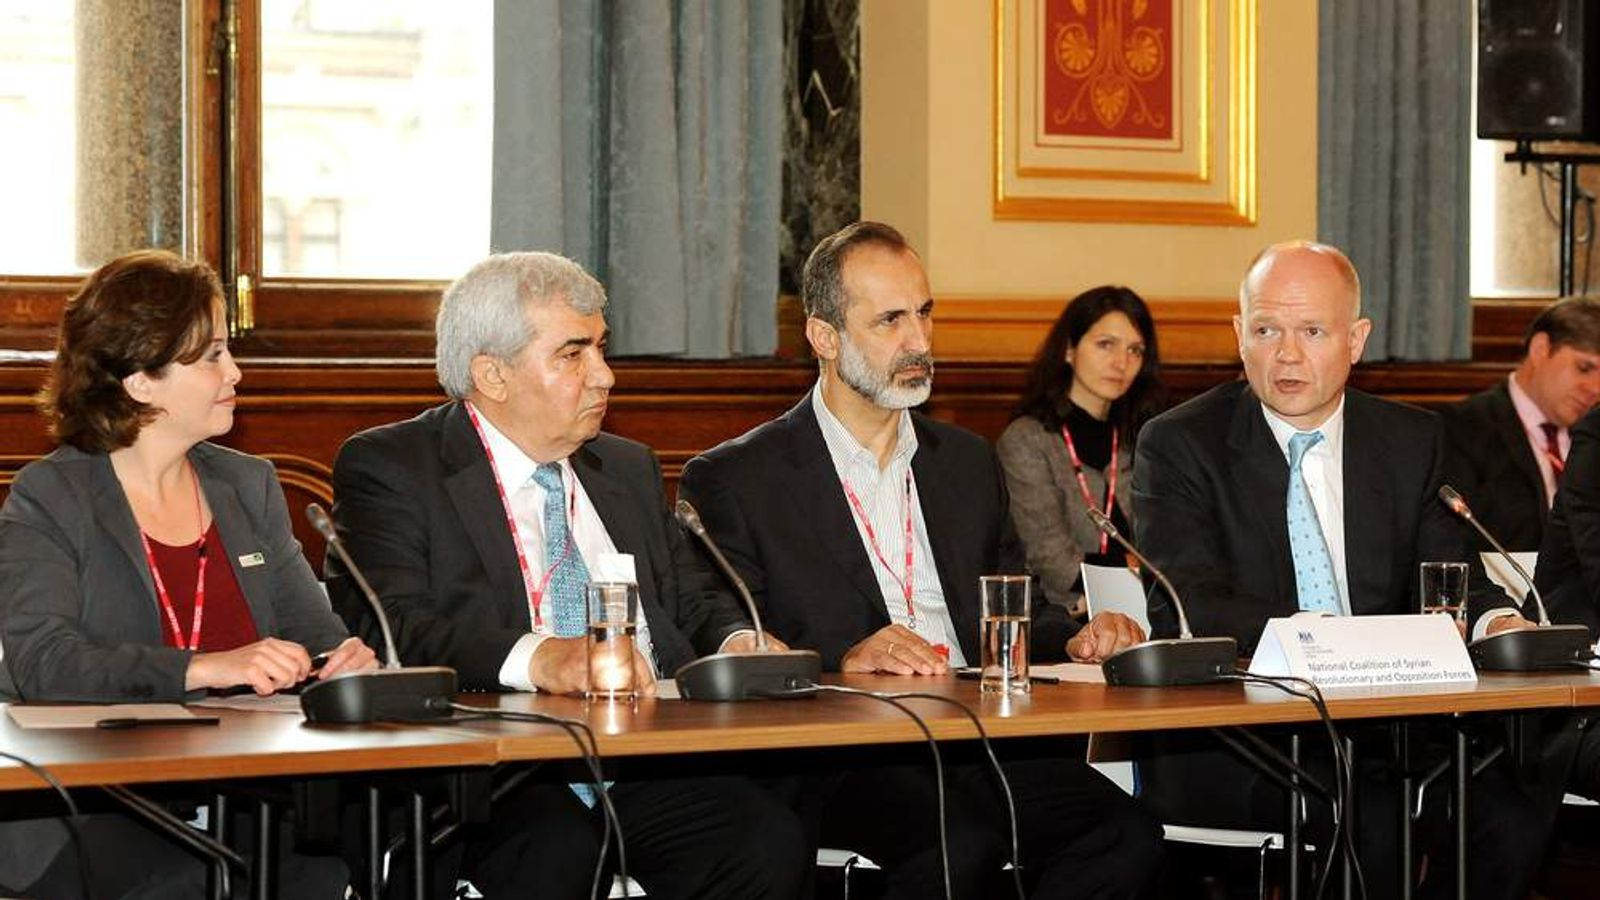 Vice President Suheir Atassi, Riad Seif, President Sheikh Ahmed Mu'az Al-Khatb, and Foreign Secretary William Hague